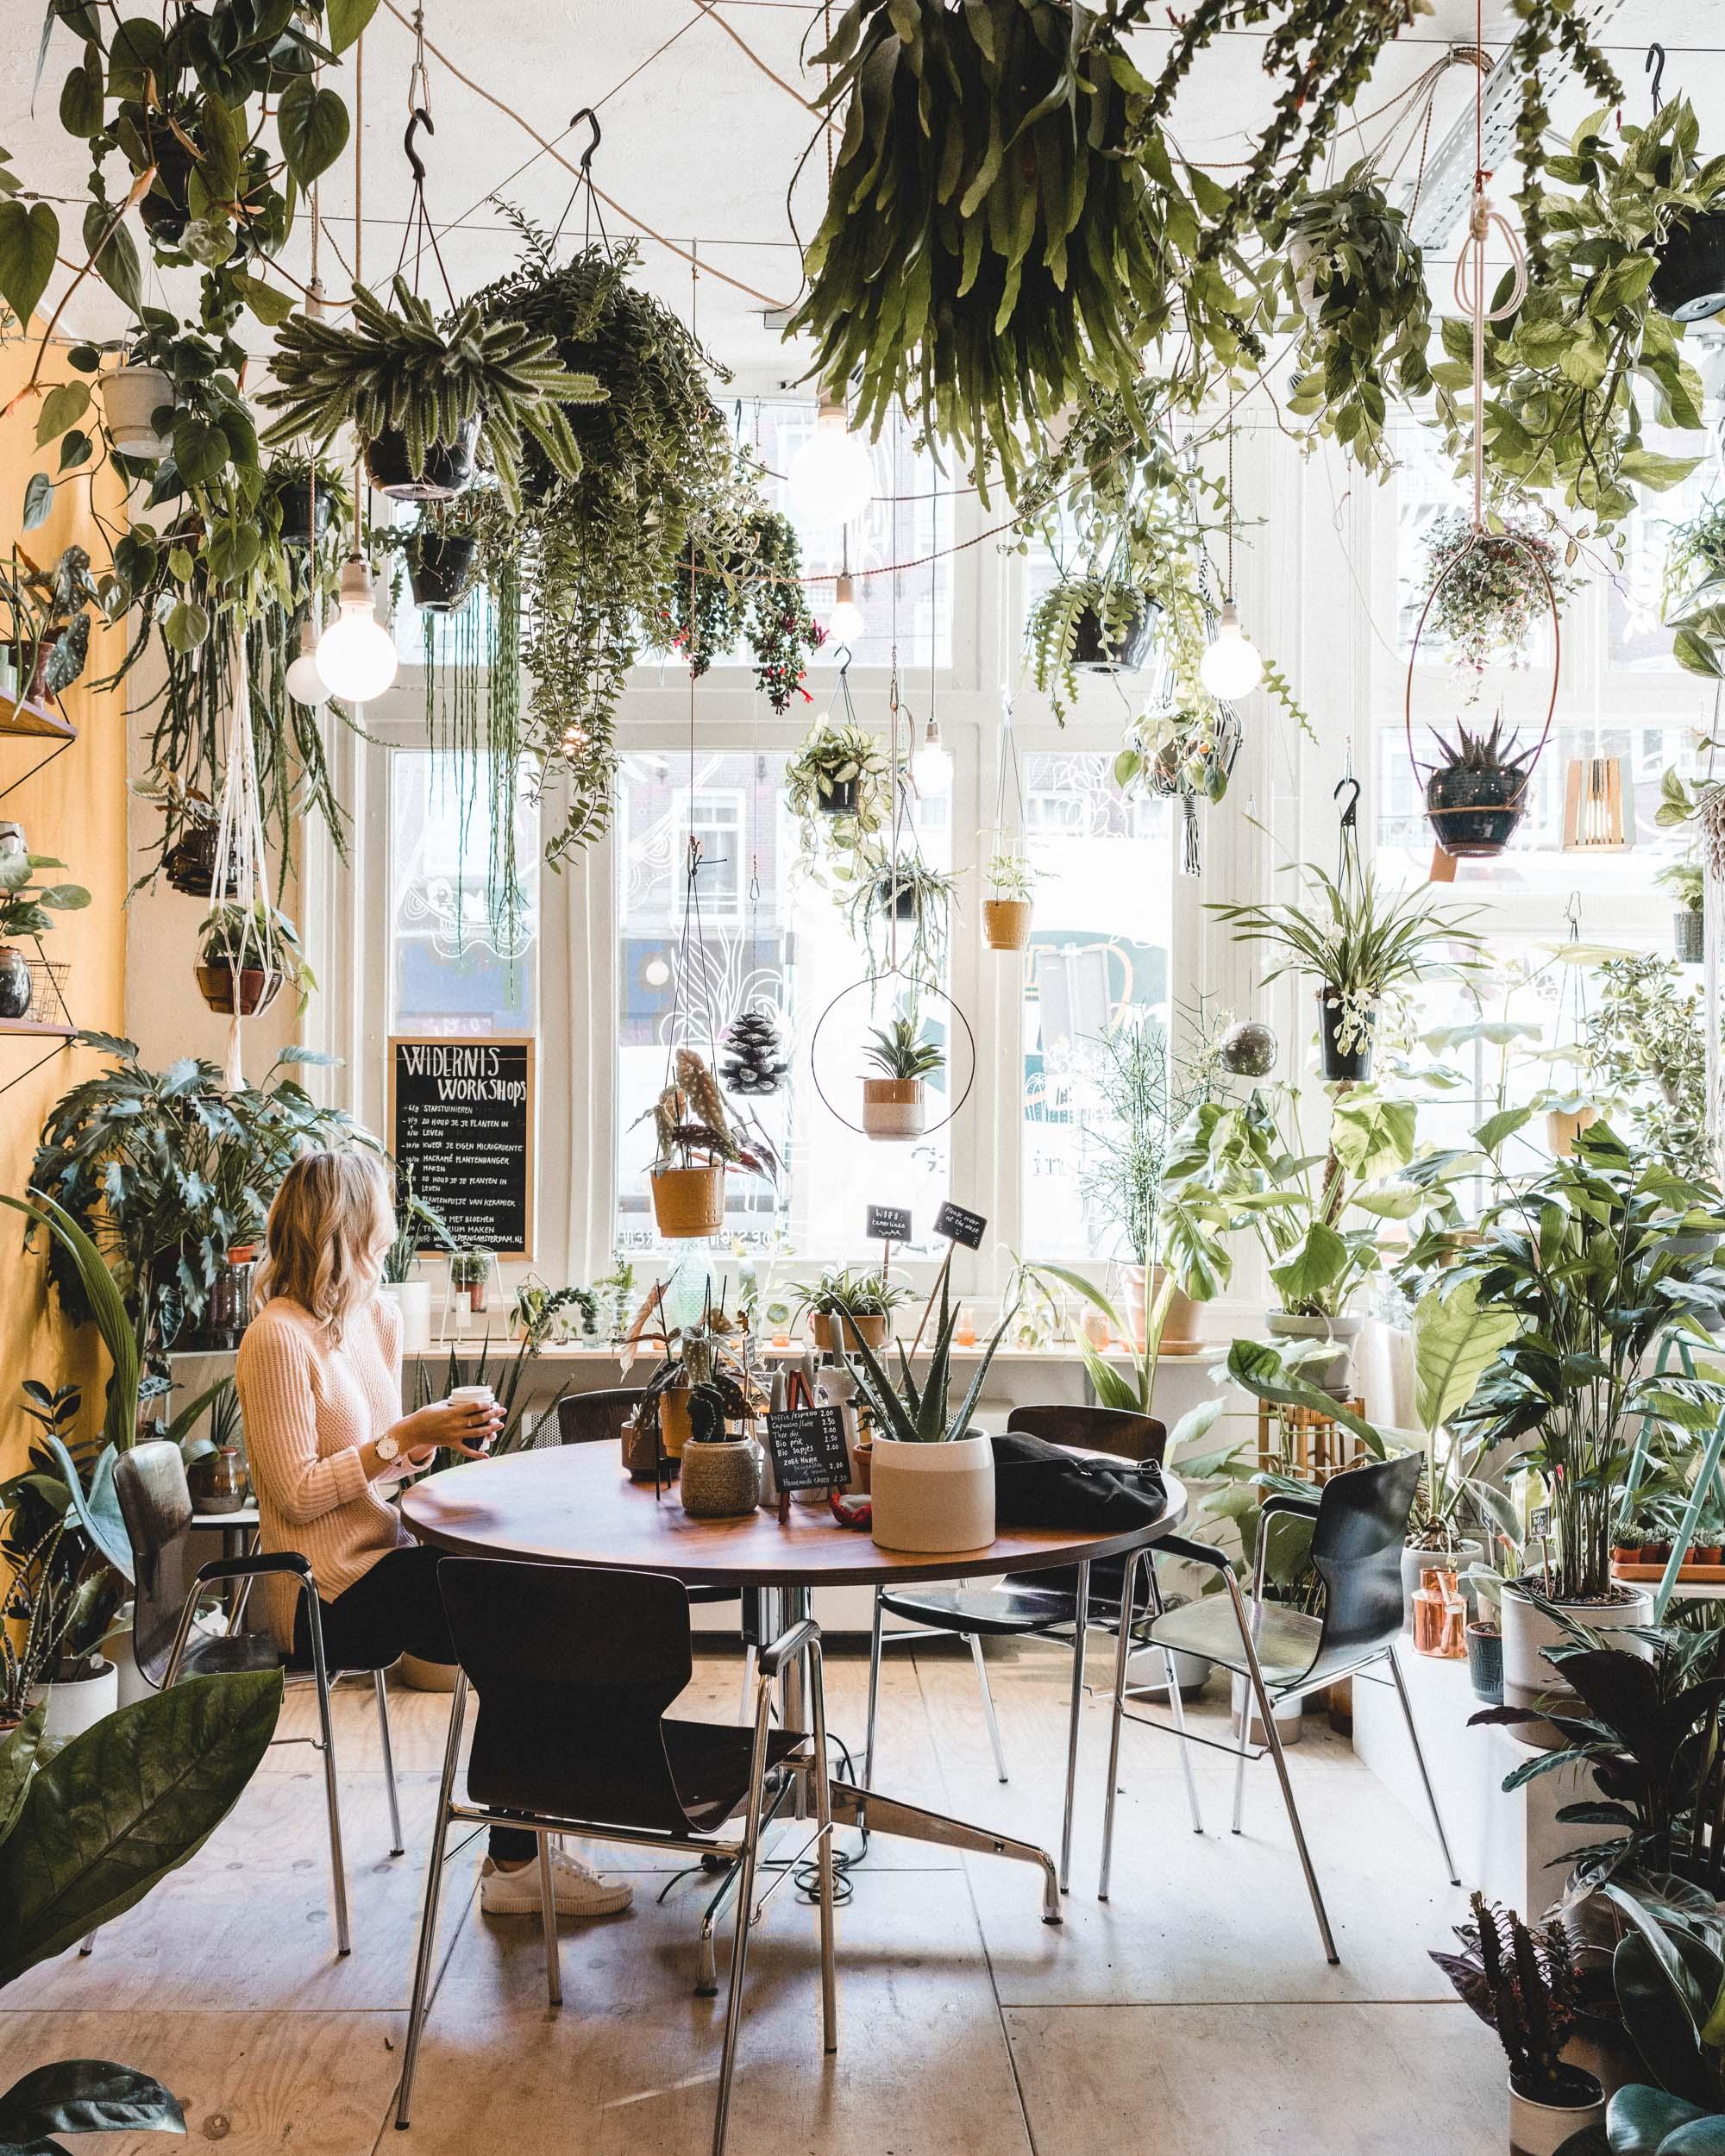 Wildernes plant store in Amsterdam's Jordaan district, Holland, The Netherlands